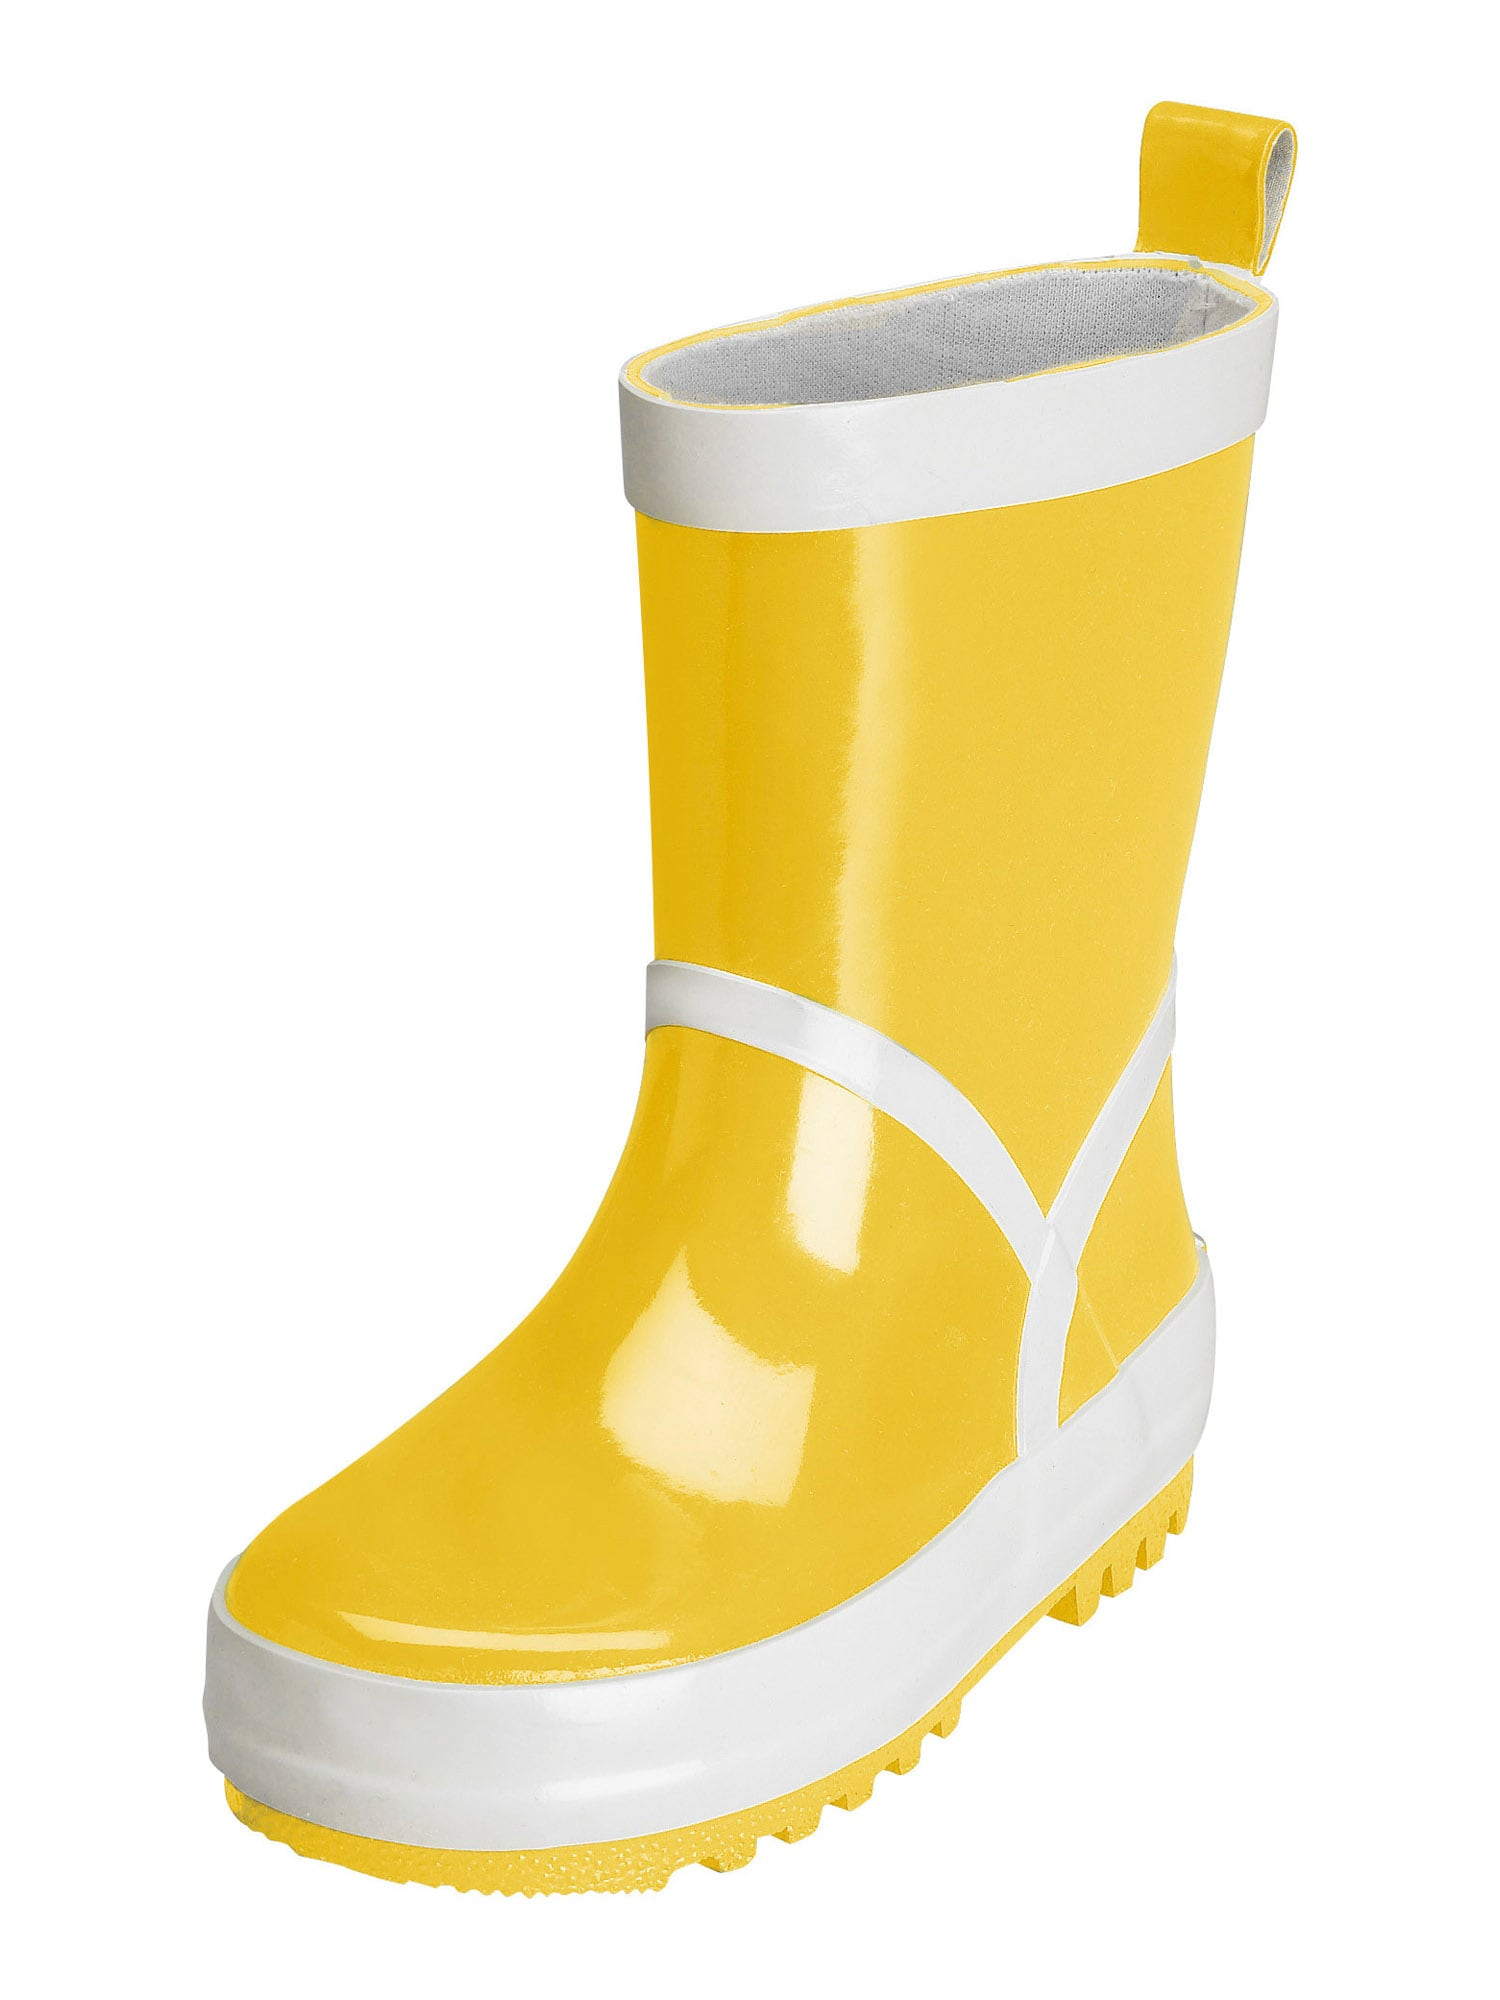 PLAYSHOES Guminiai batai geltona / balta